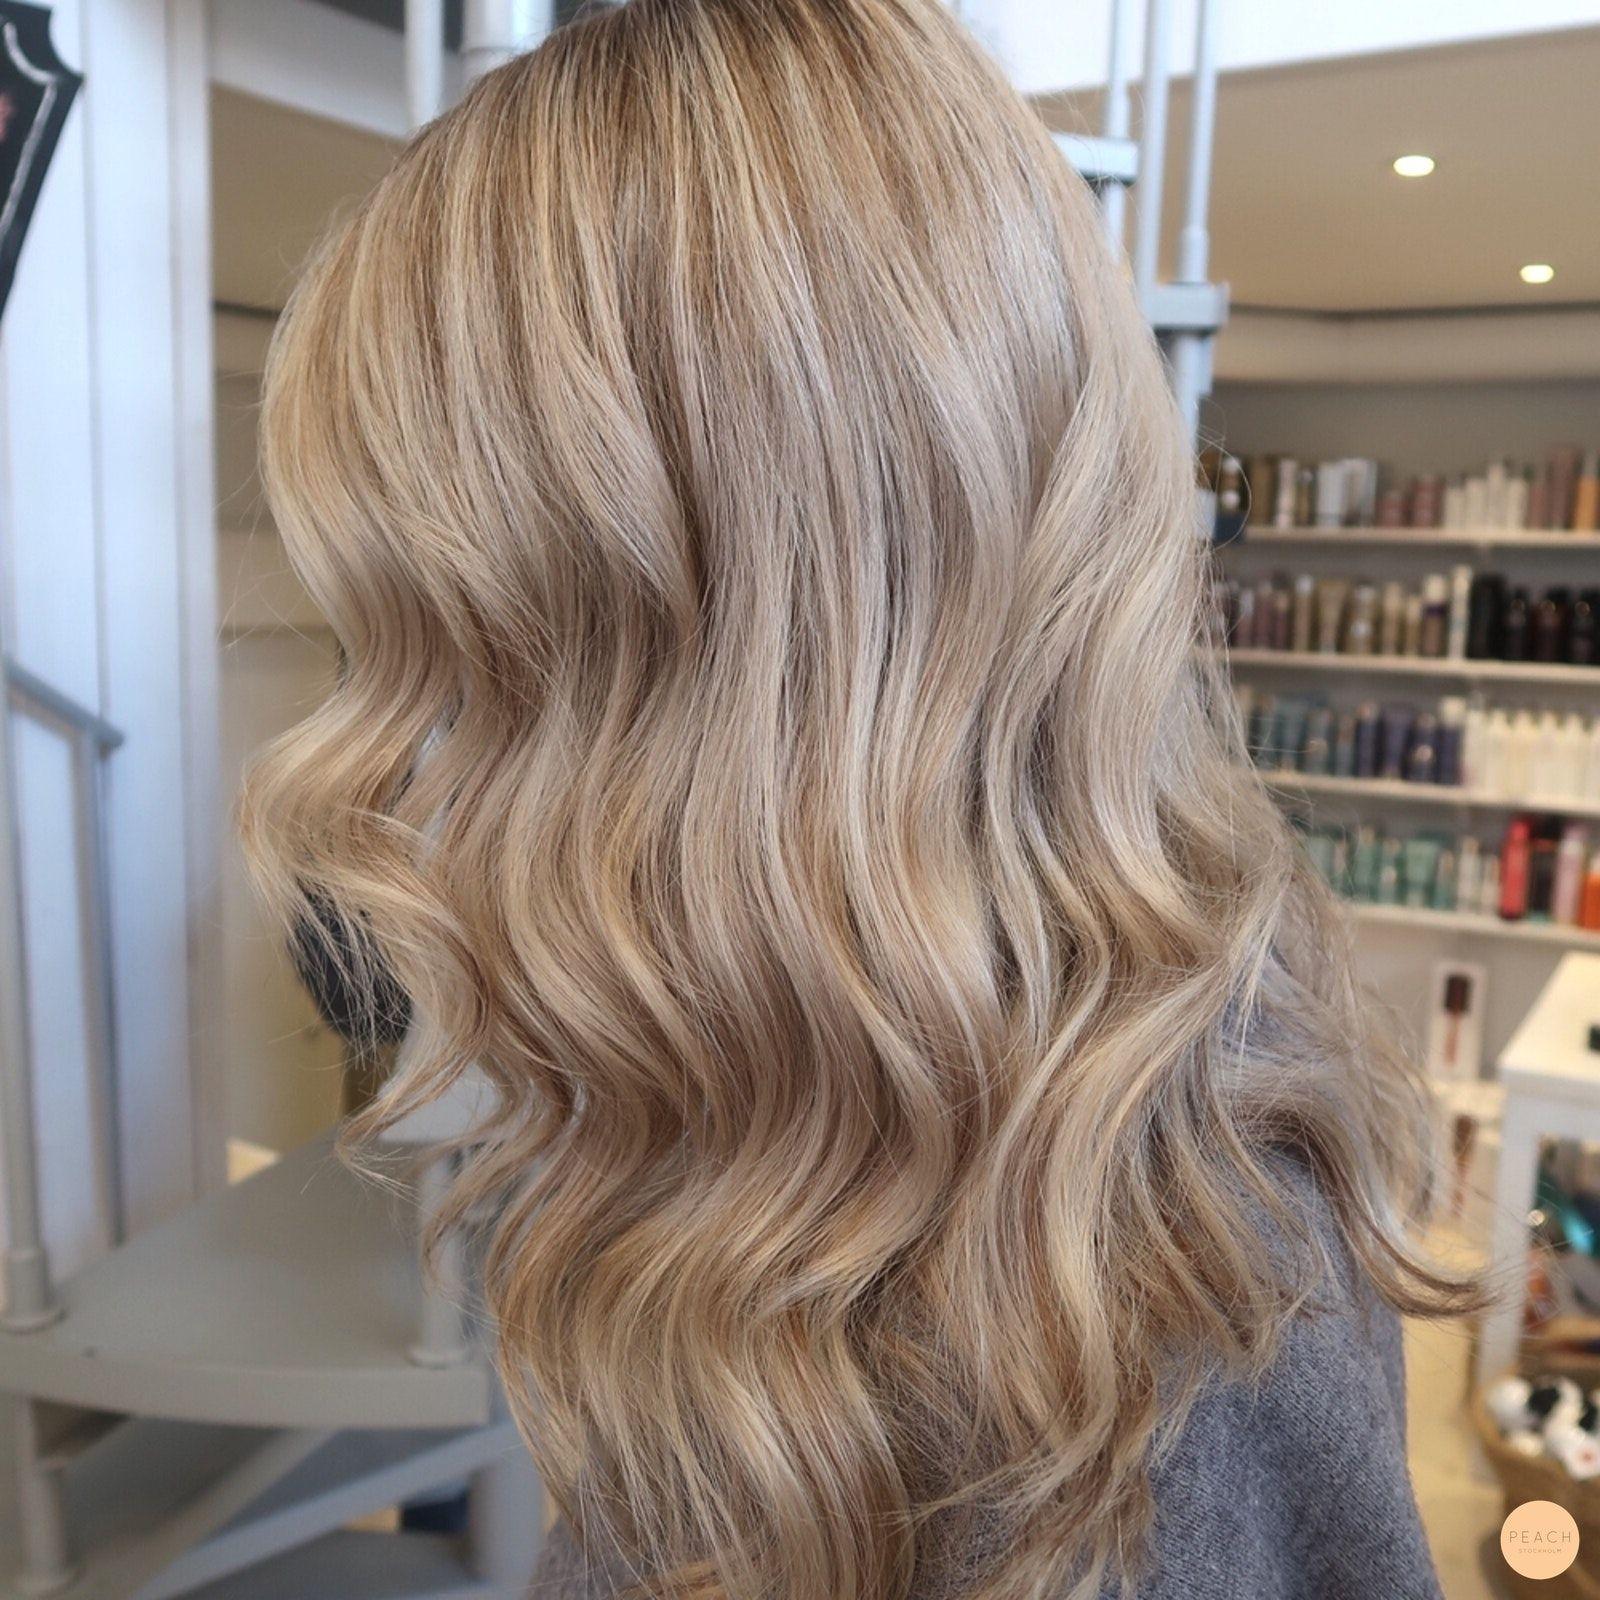 Lowlights I Blont Har Peach Stockholm Blont Har Beige Blont Har Frisyrer